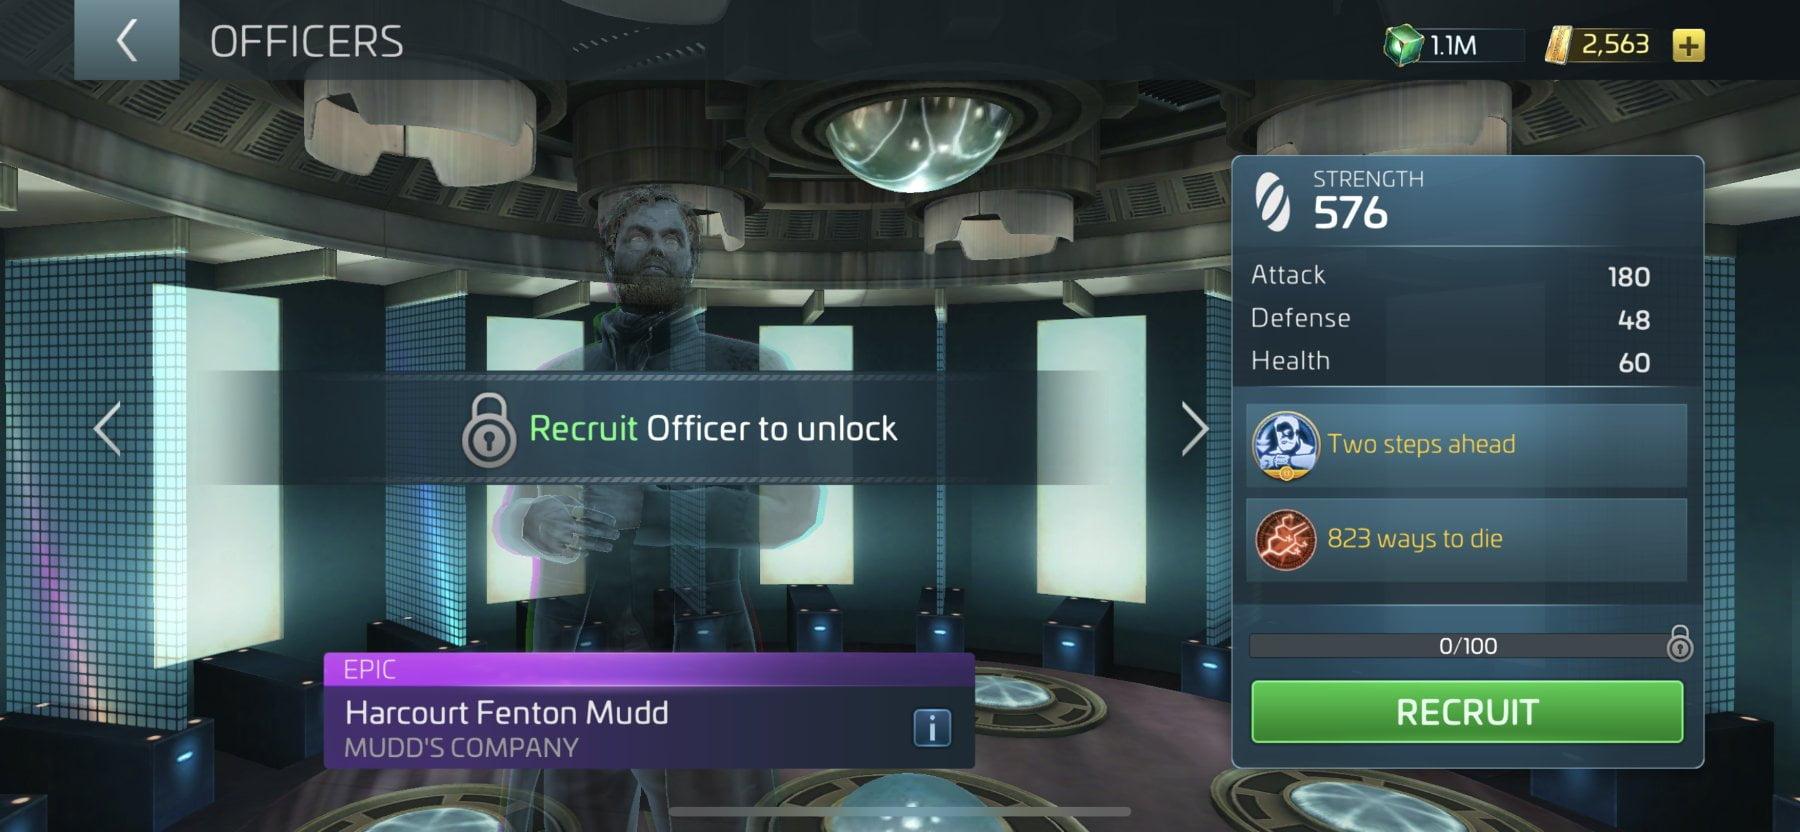 Star Trek Fleet Command Officer Mudd